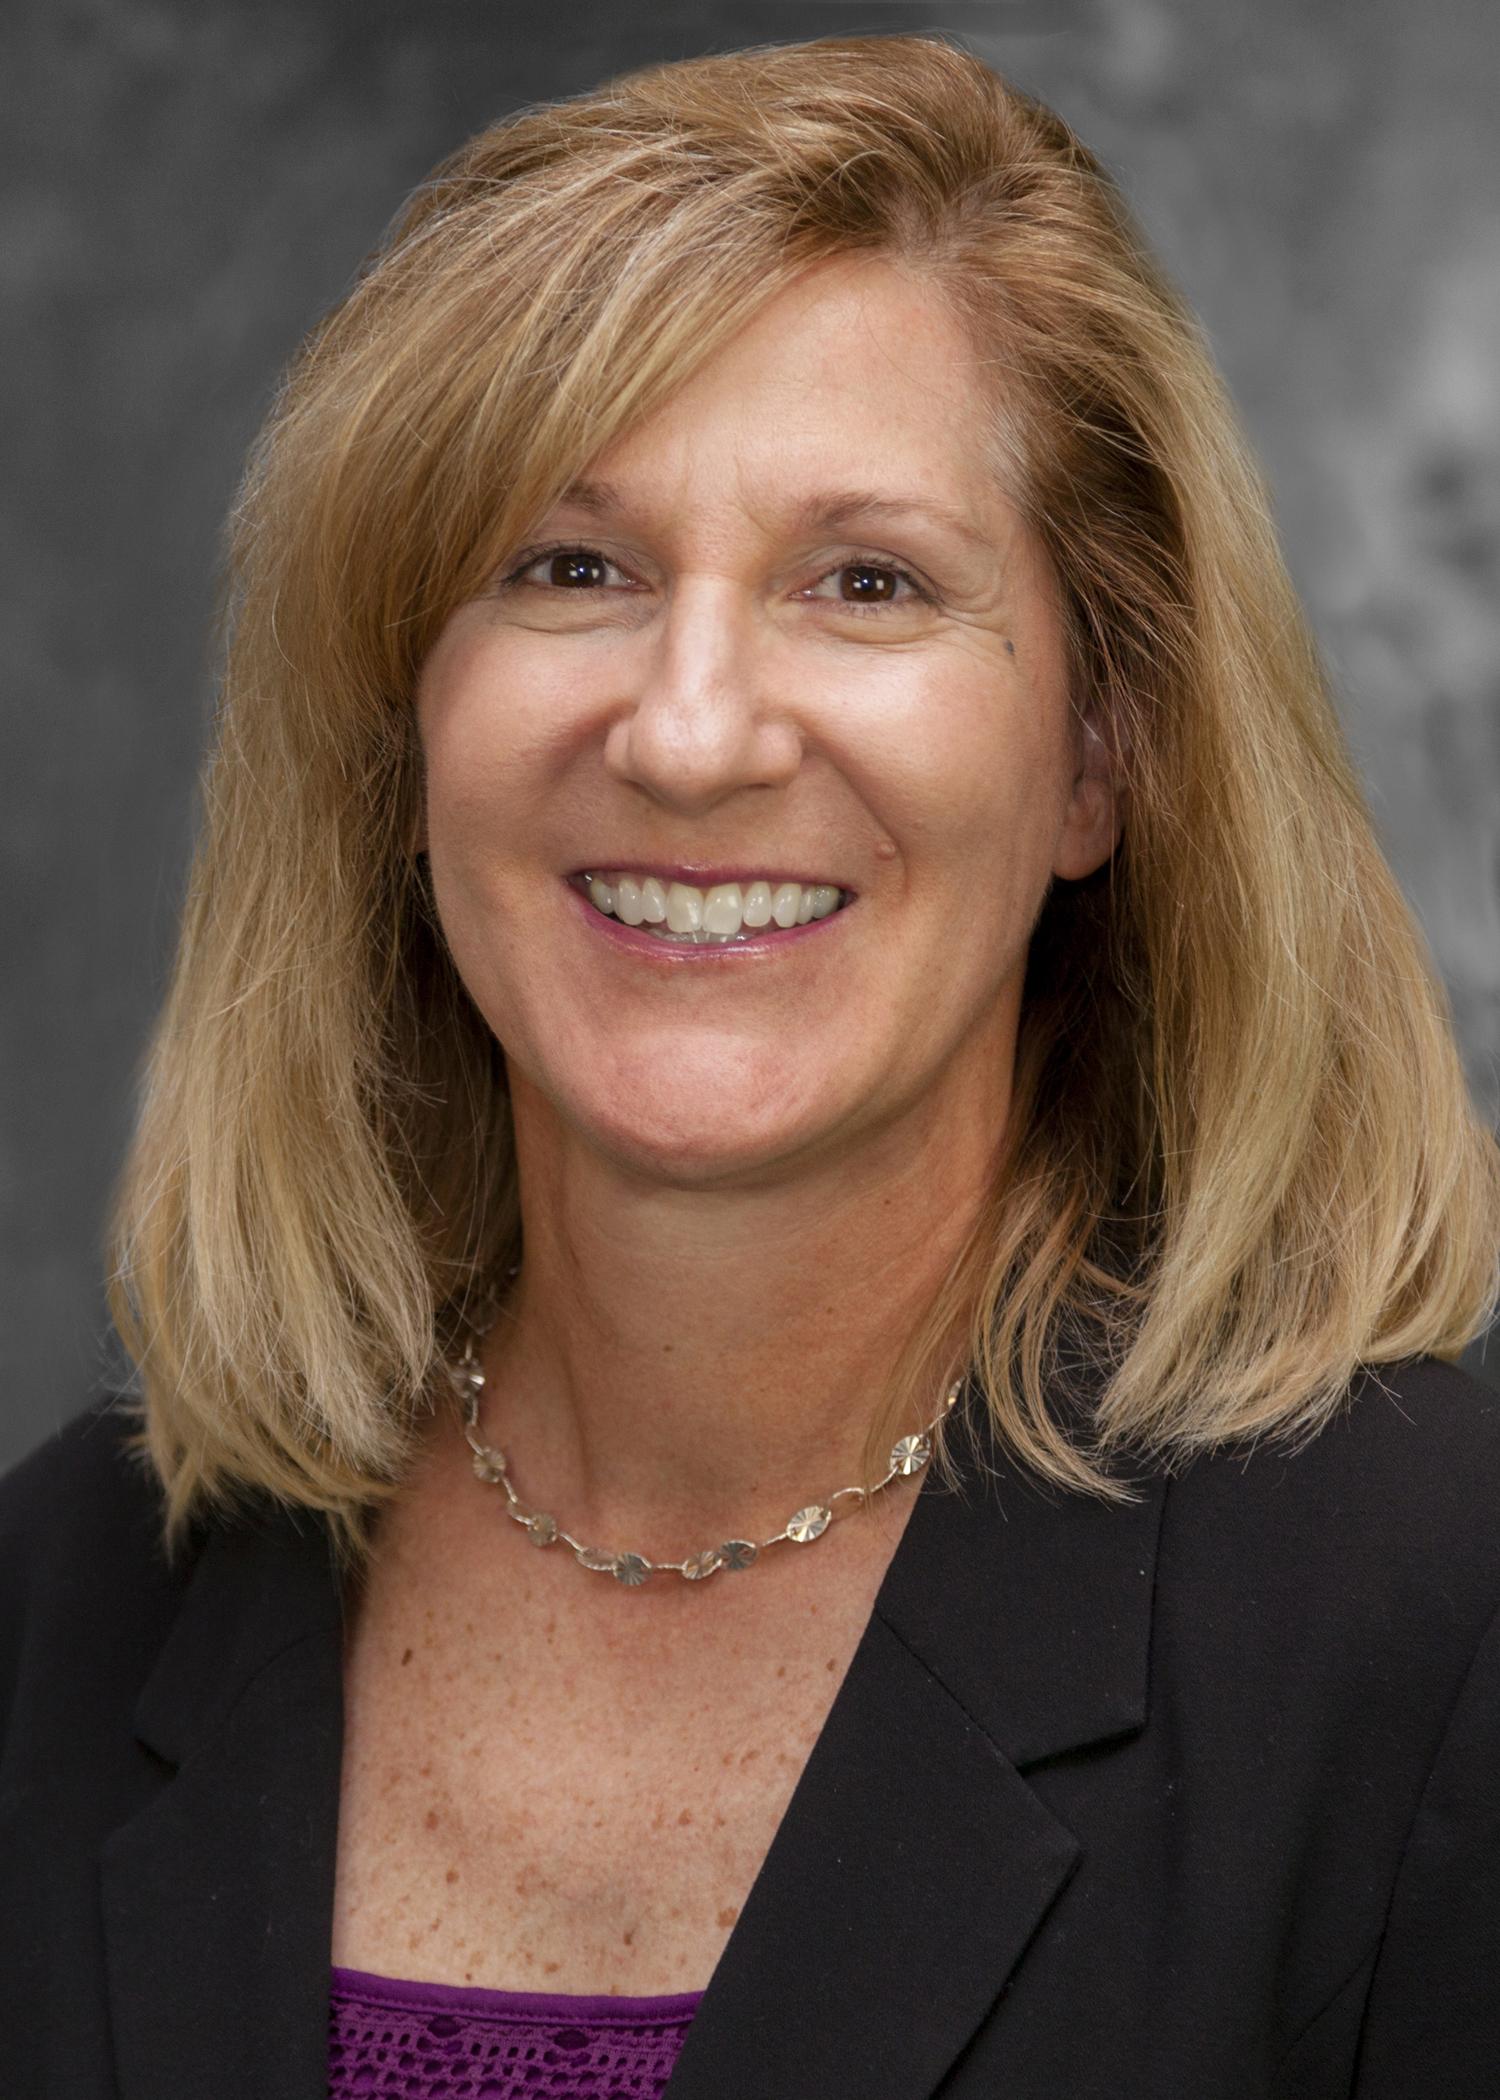 Janice L Kaczmarek, Director, ECRI Guidelines Trust®